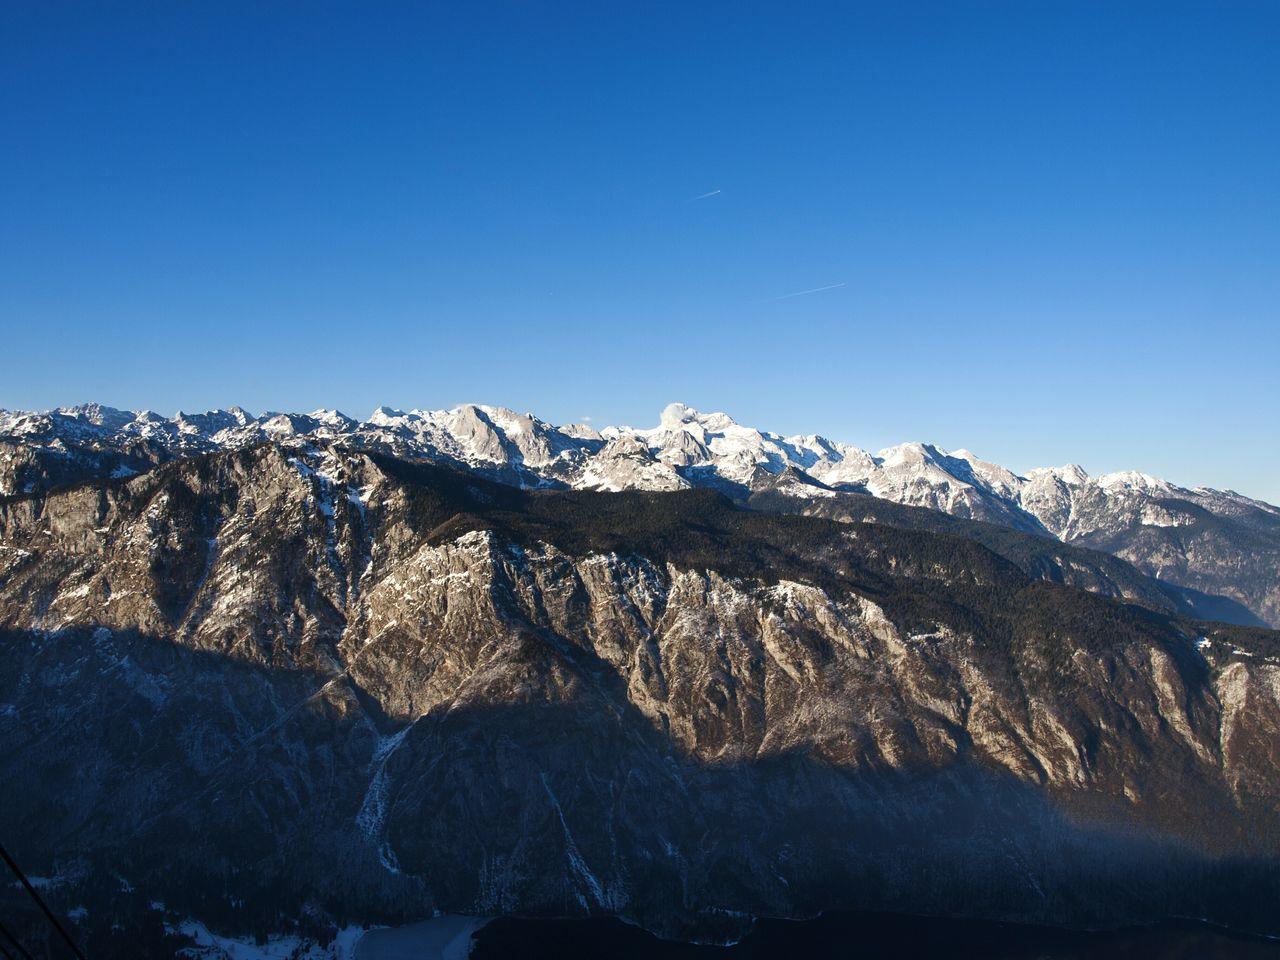 Mountain Winter Nature No People Snow Beauty In Nature Outdoors Blue Slovenia Vogel Bohinj, Slovenia Clear Sky Sky